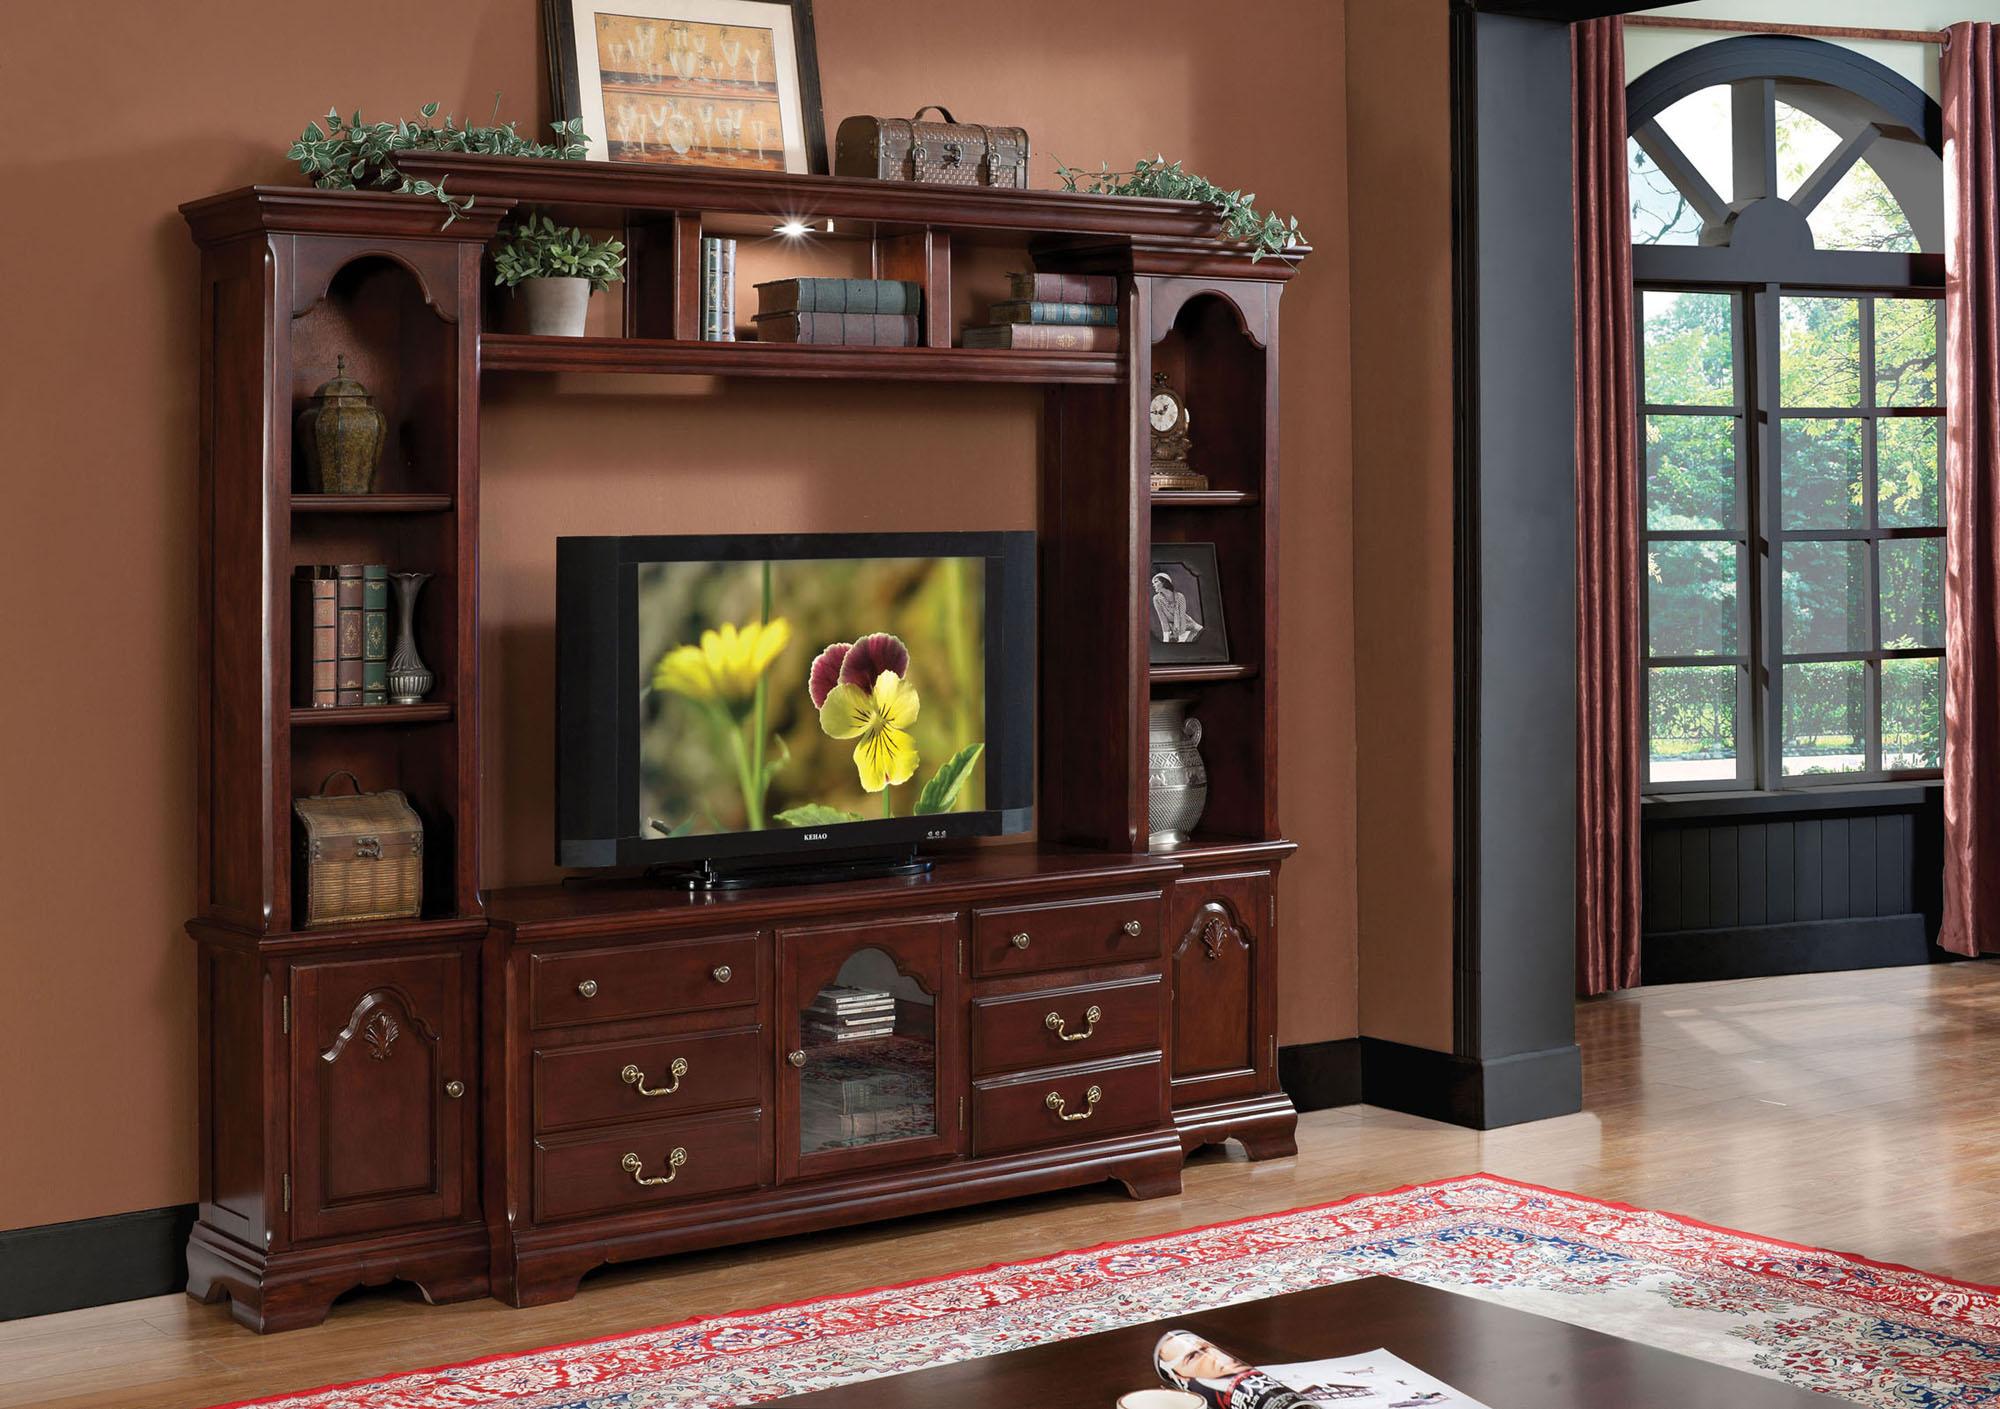 Acme furniture acme furniture cherries and wood furniture